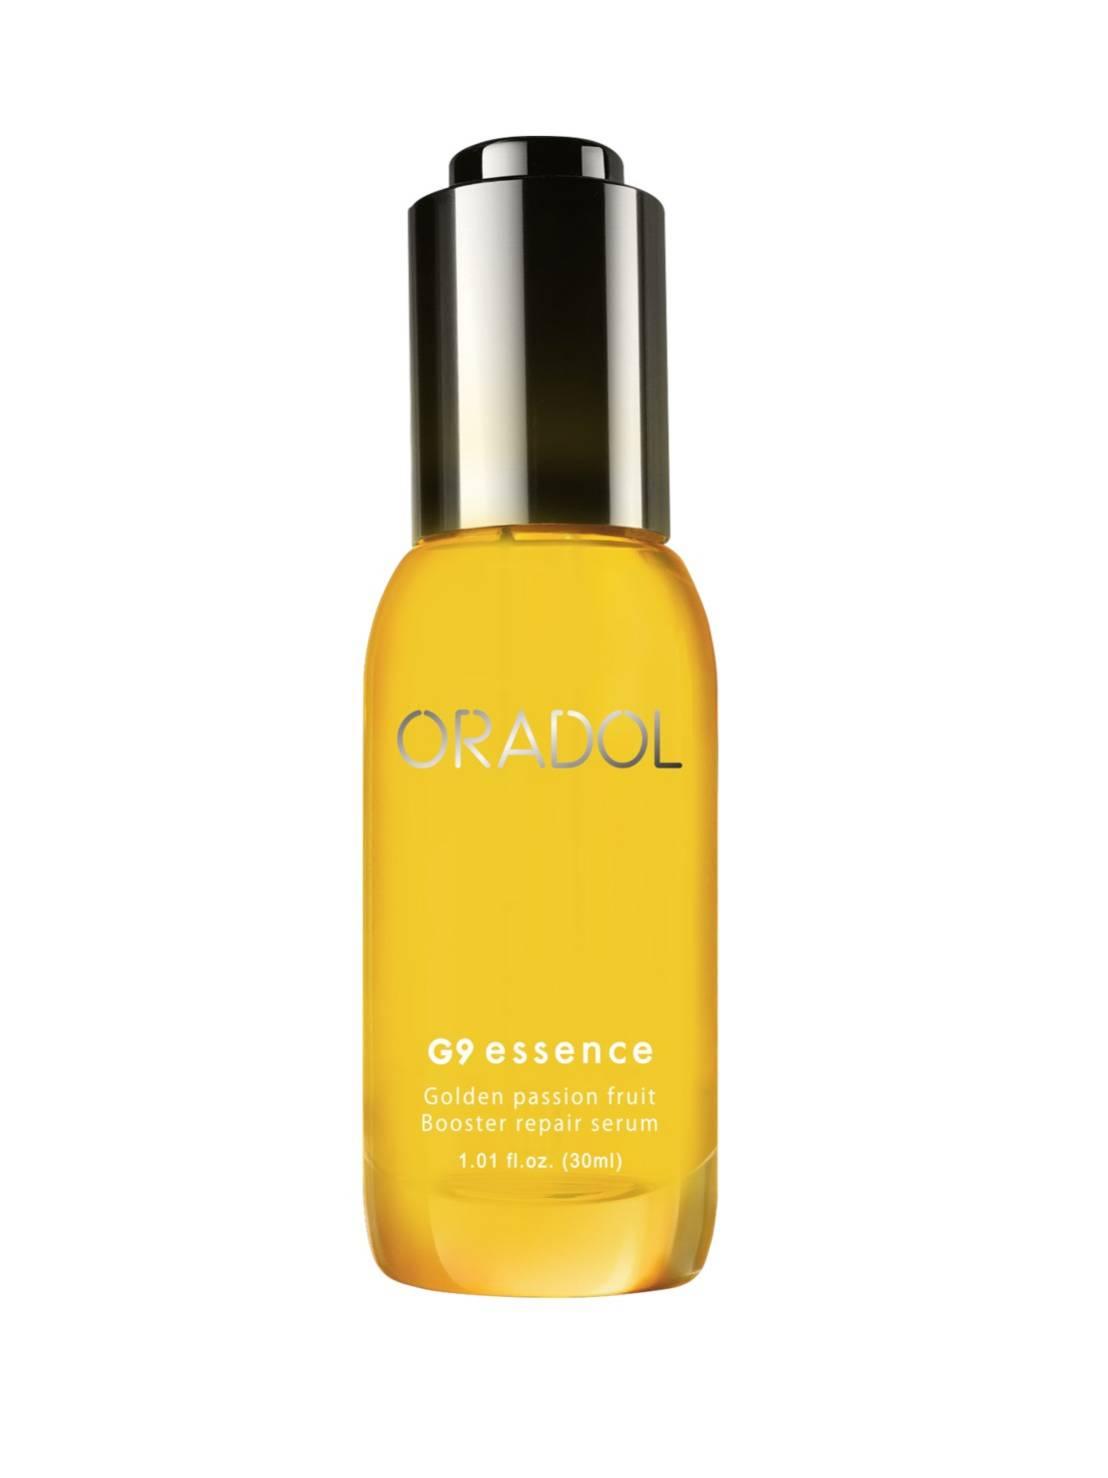 Oradol serum 30 ml ออราดอลซีรั่ม Booster repair serum